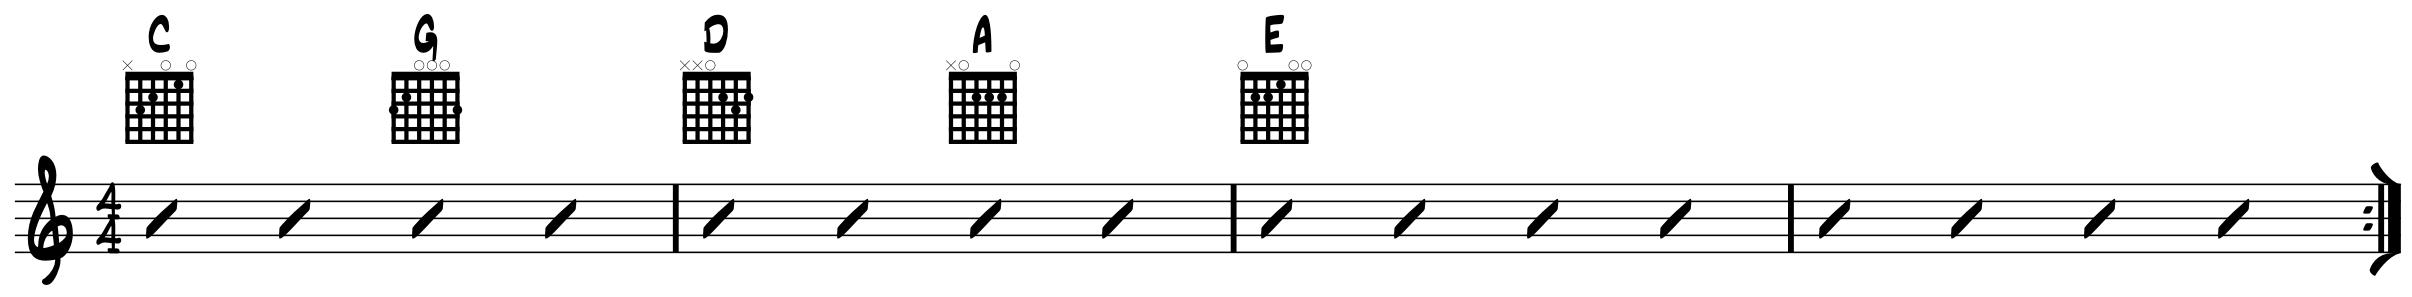 hey joe chords